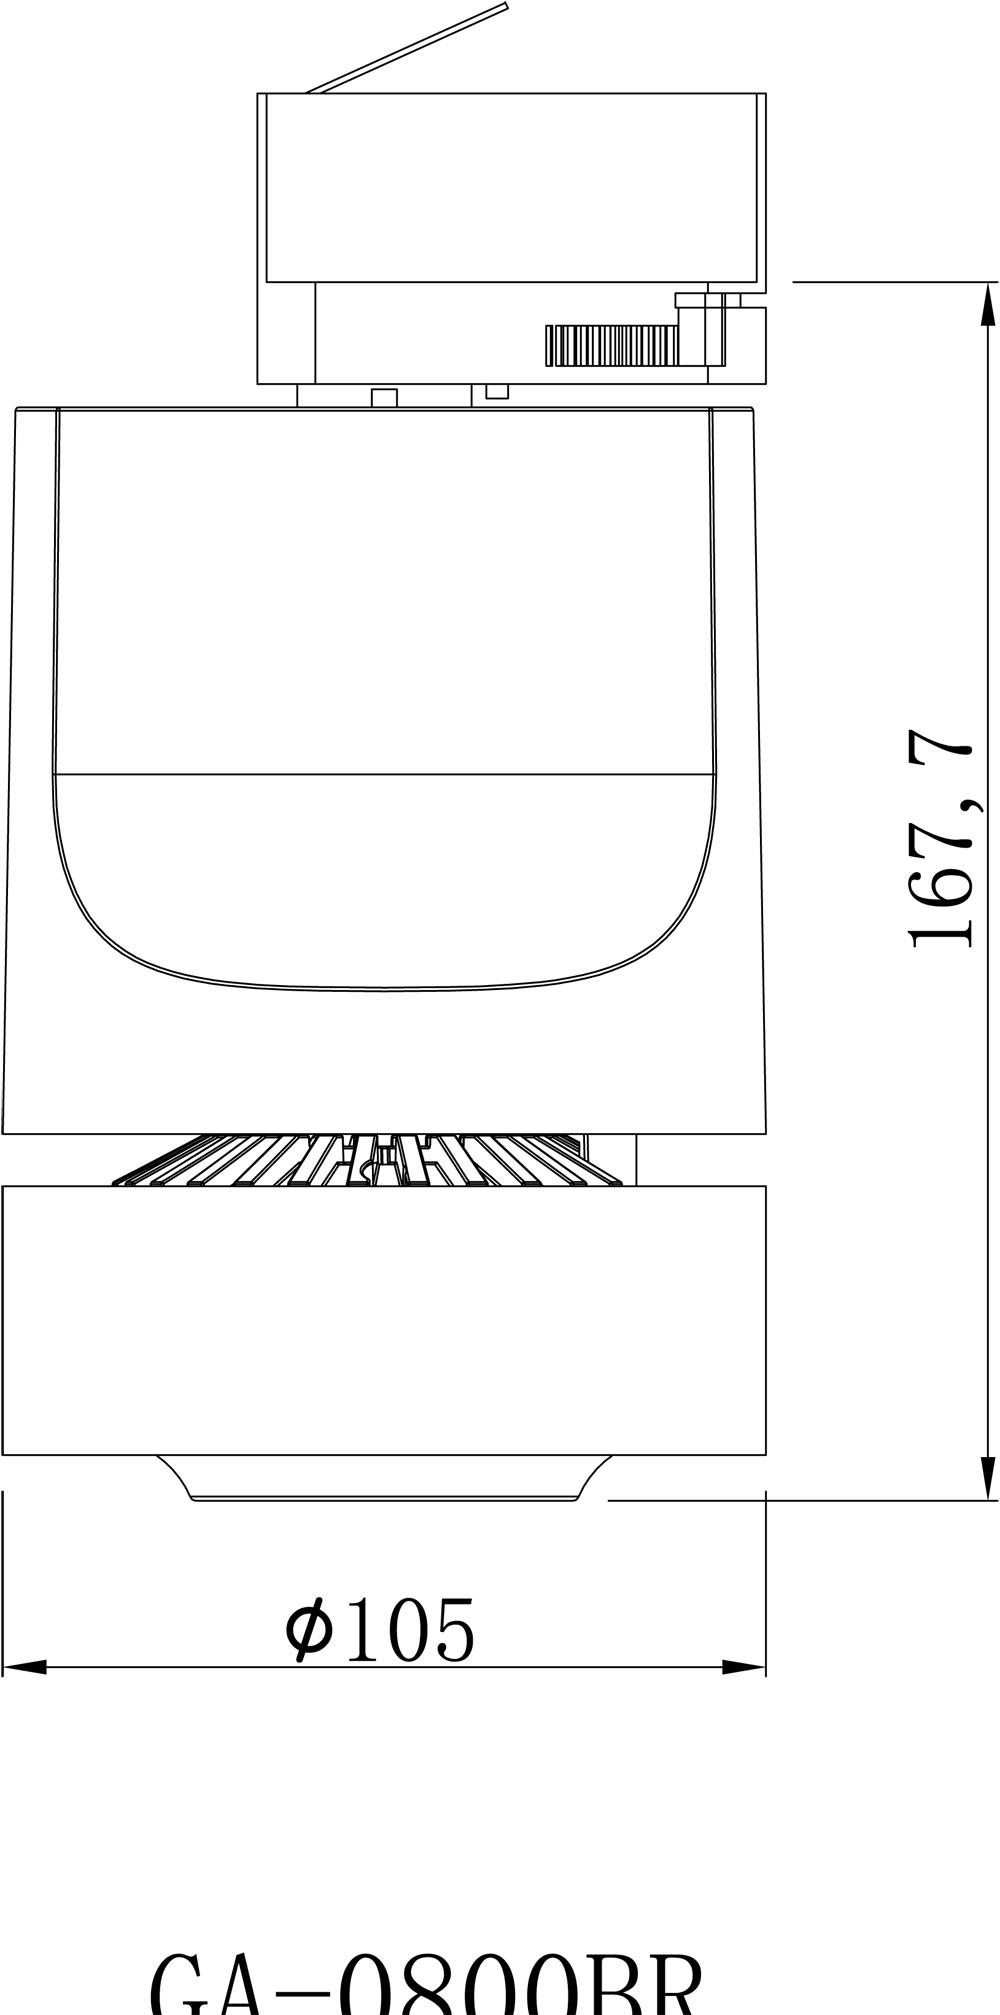 GA-0800BR-尺寸图.jpg